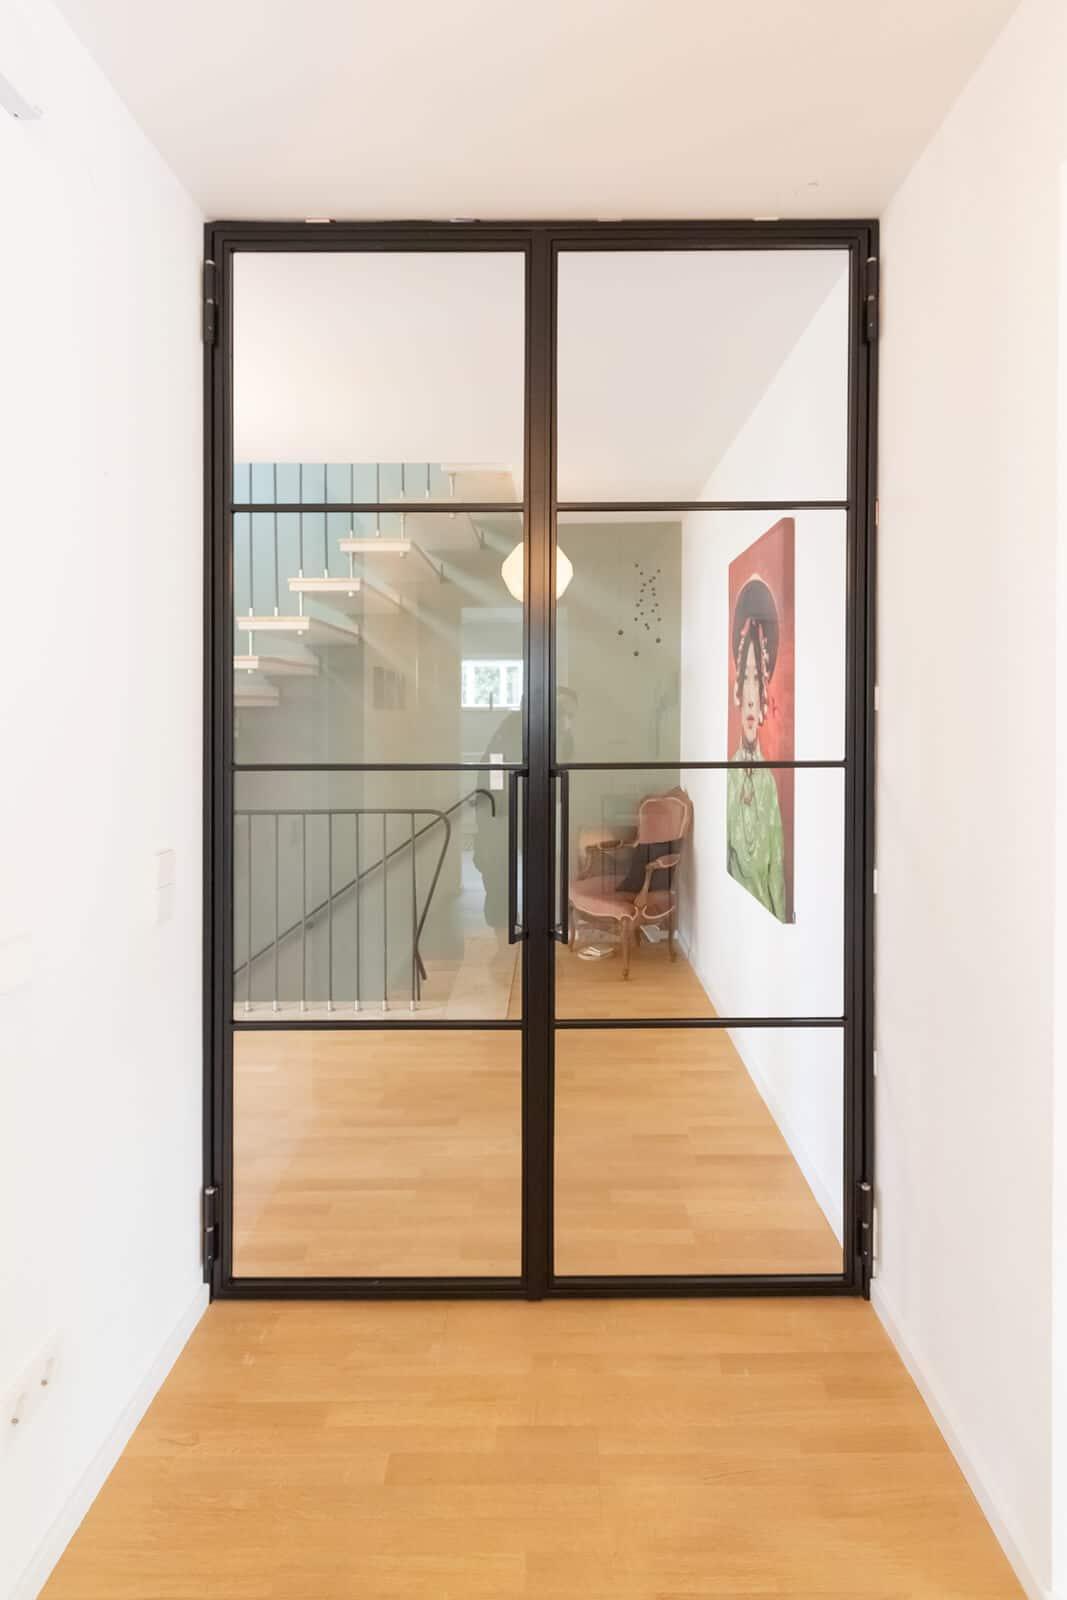 Loftstahl - Loft-Stahl, N51E12 , Design Doppeltuer, Drehtür, Sahltür, Stahl Loft Tür, Lofttür, Loftdoor, Glastür, Glastrennwand, Windfang, Bauhaustür, Industrial Door